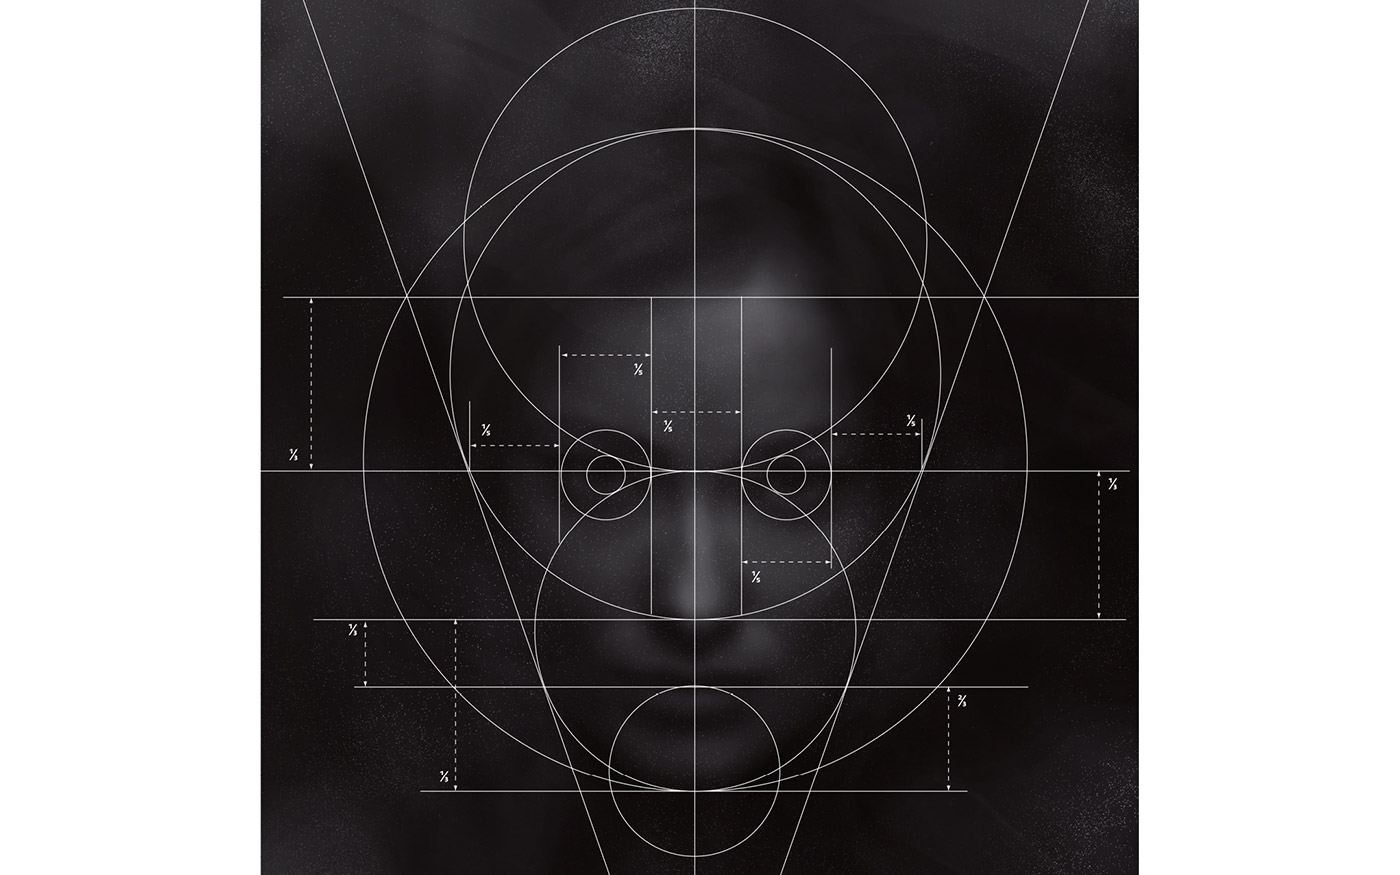 der-getreue-roboter-illustration-goldener-schnitt